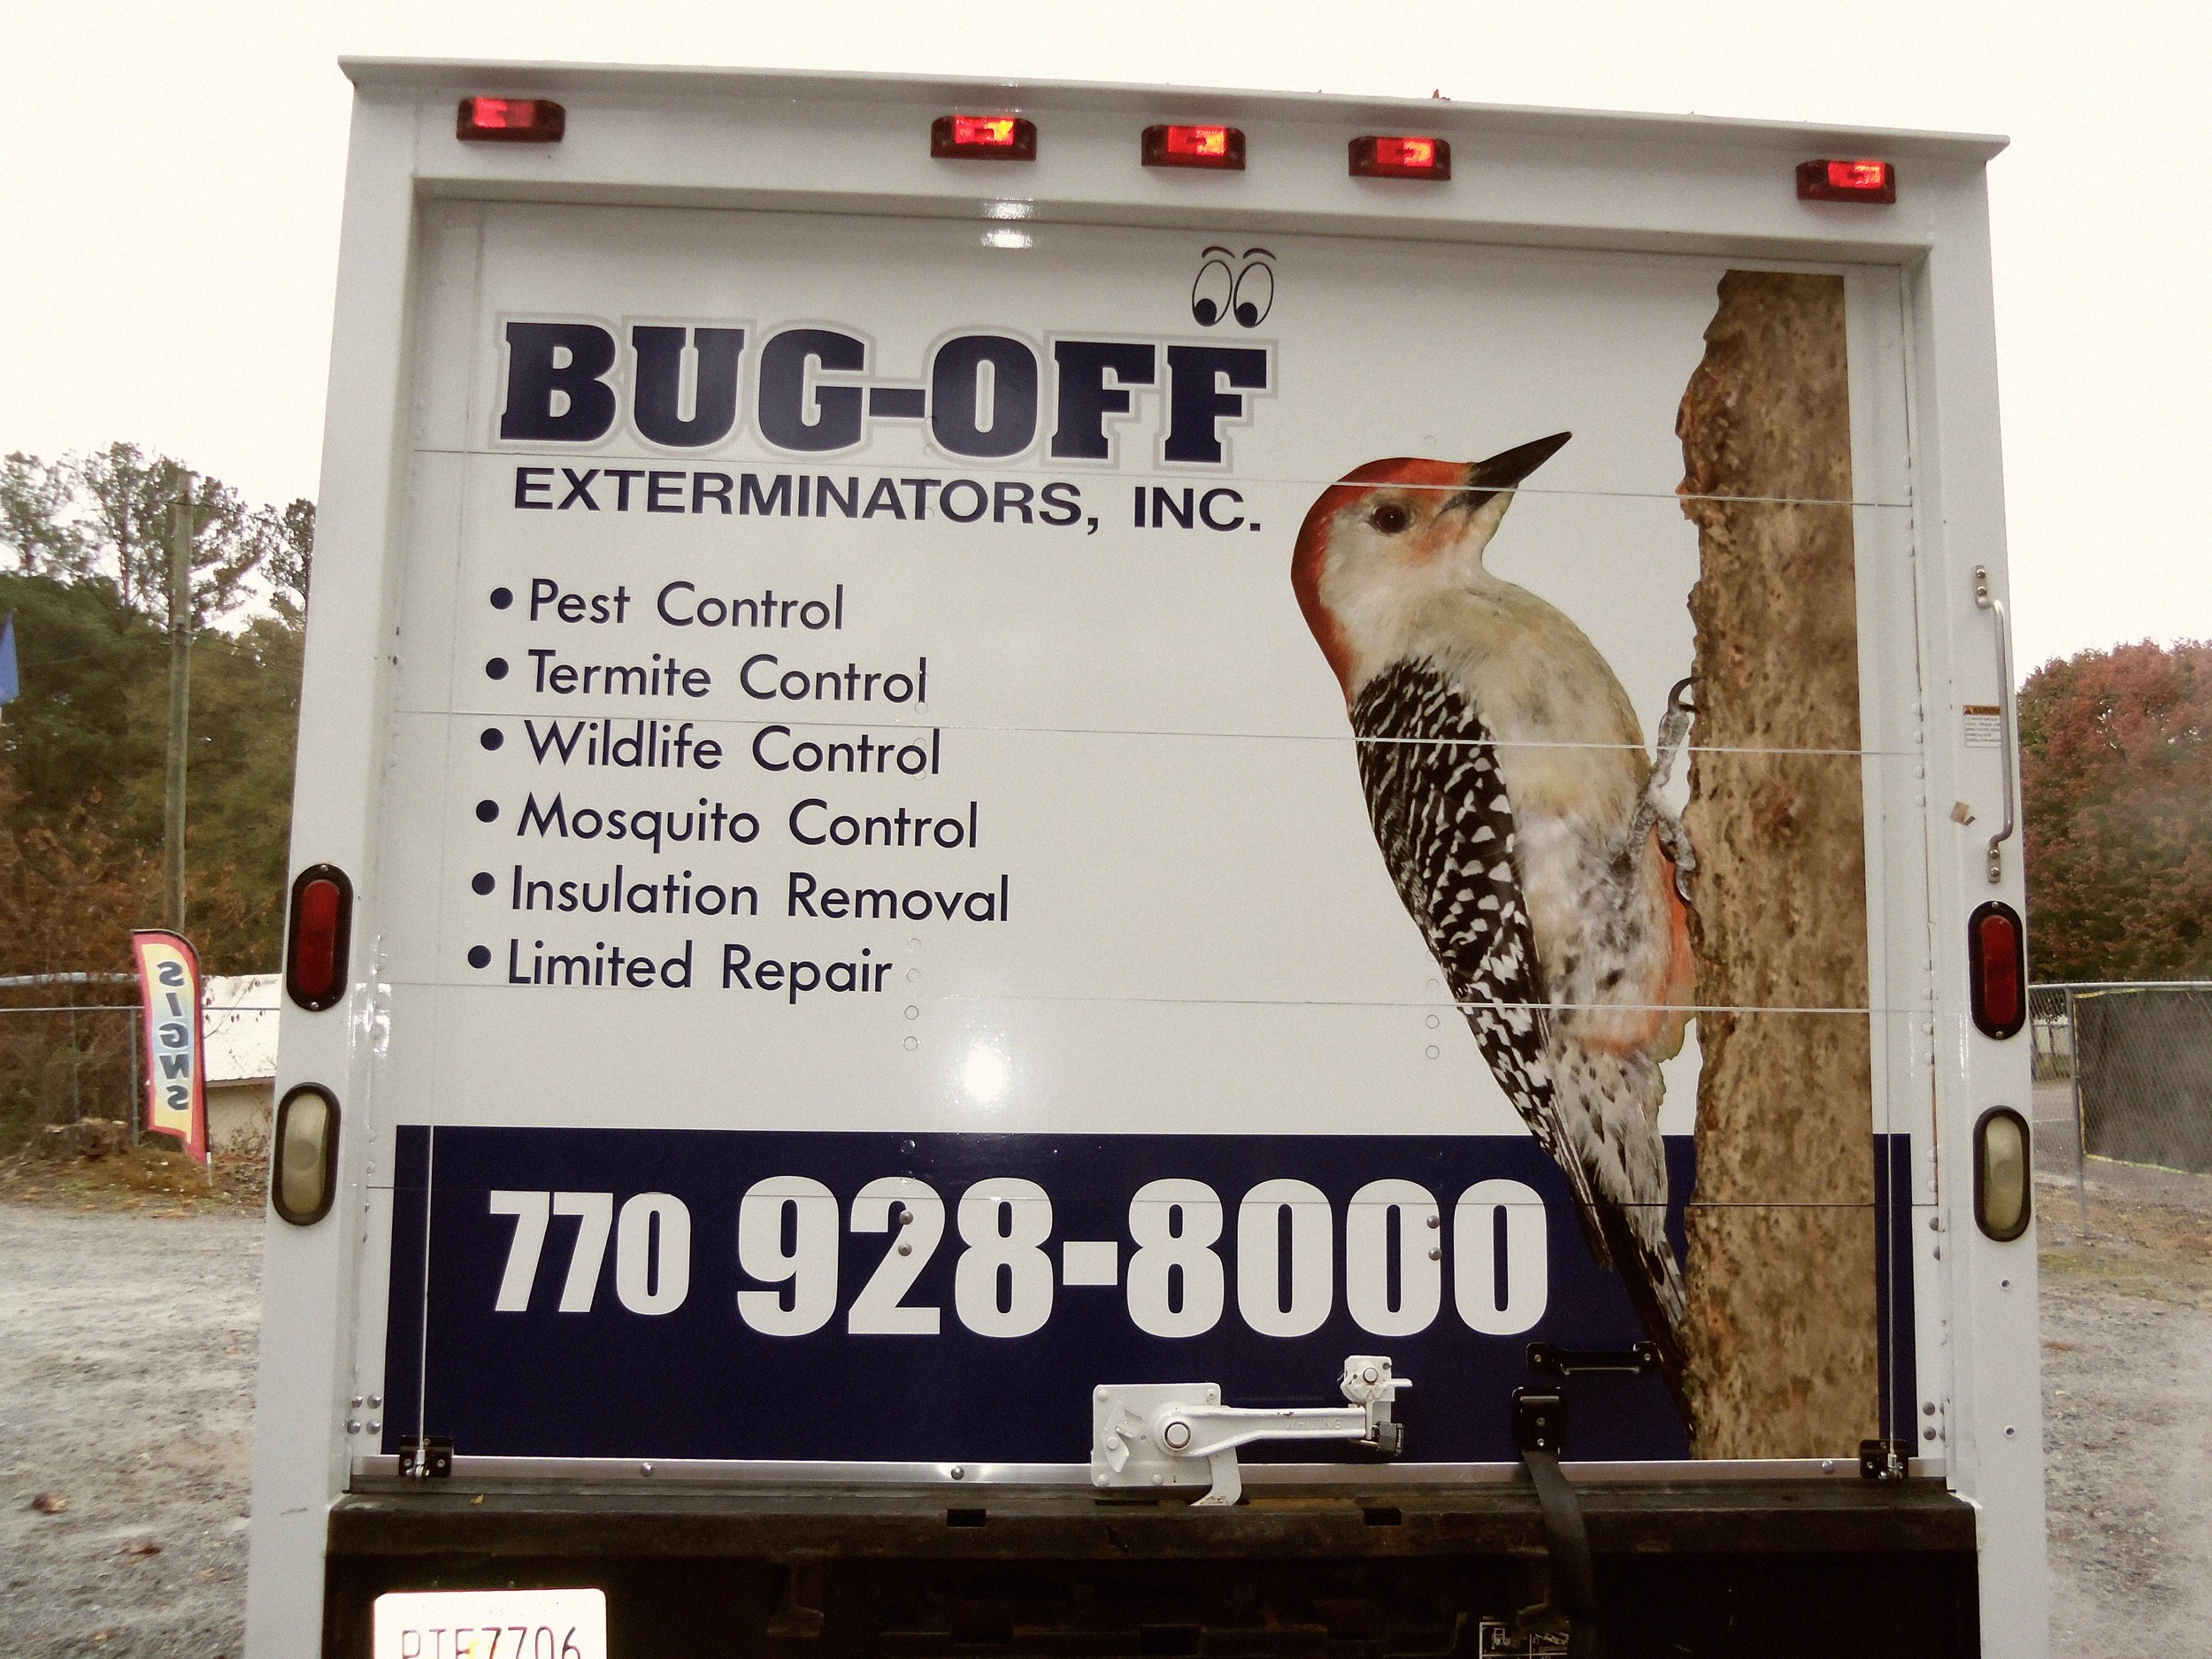 bugoff box truck2.JPG